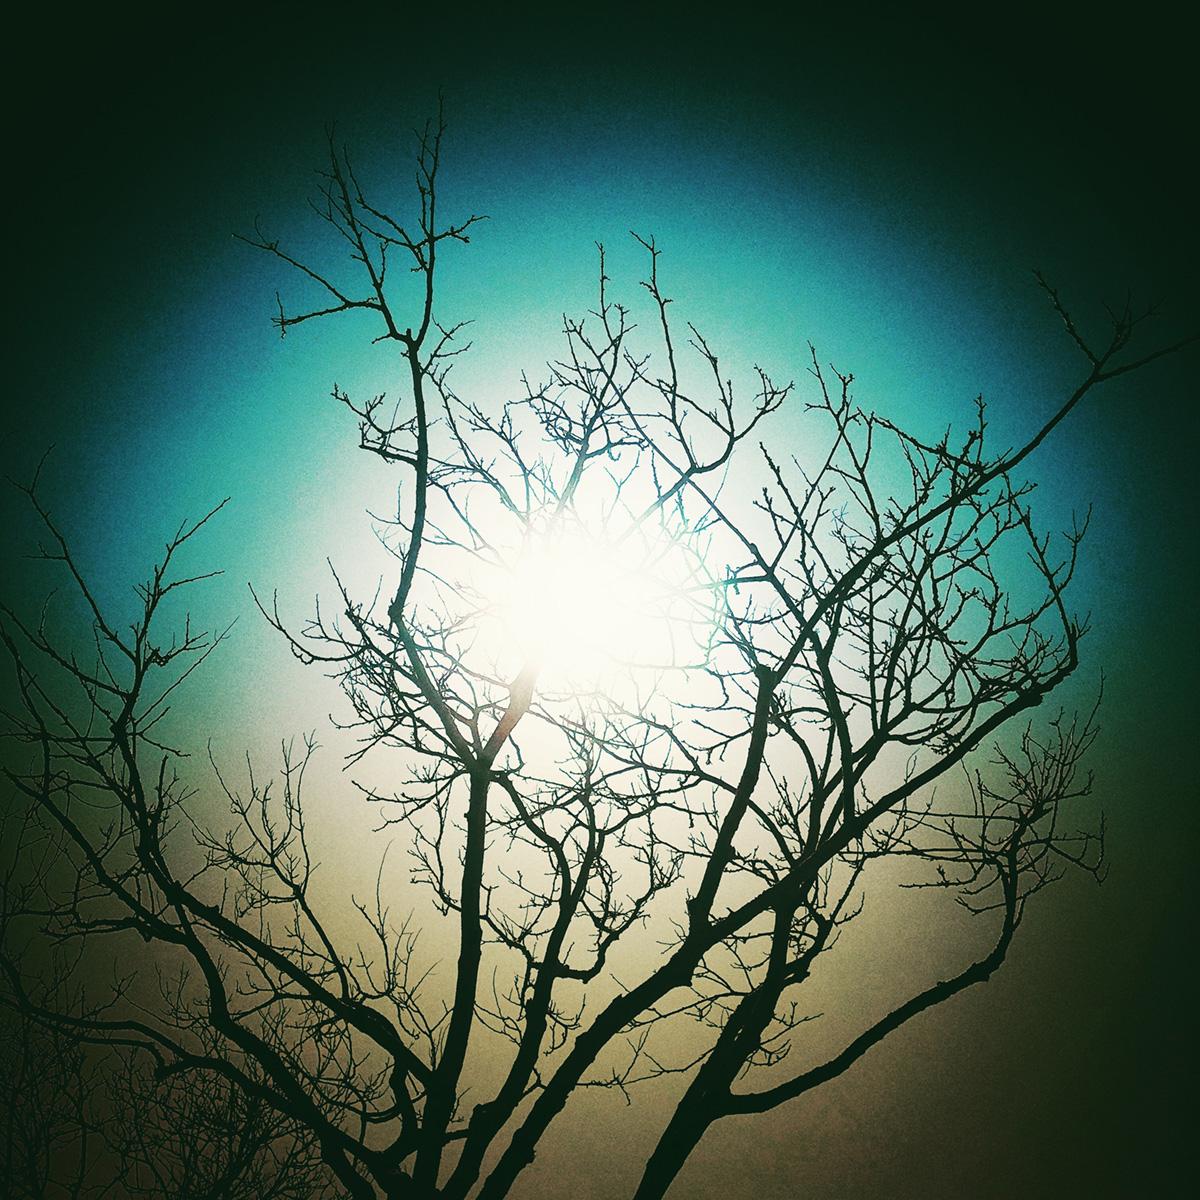 Bright Light in the Bare Tree 2